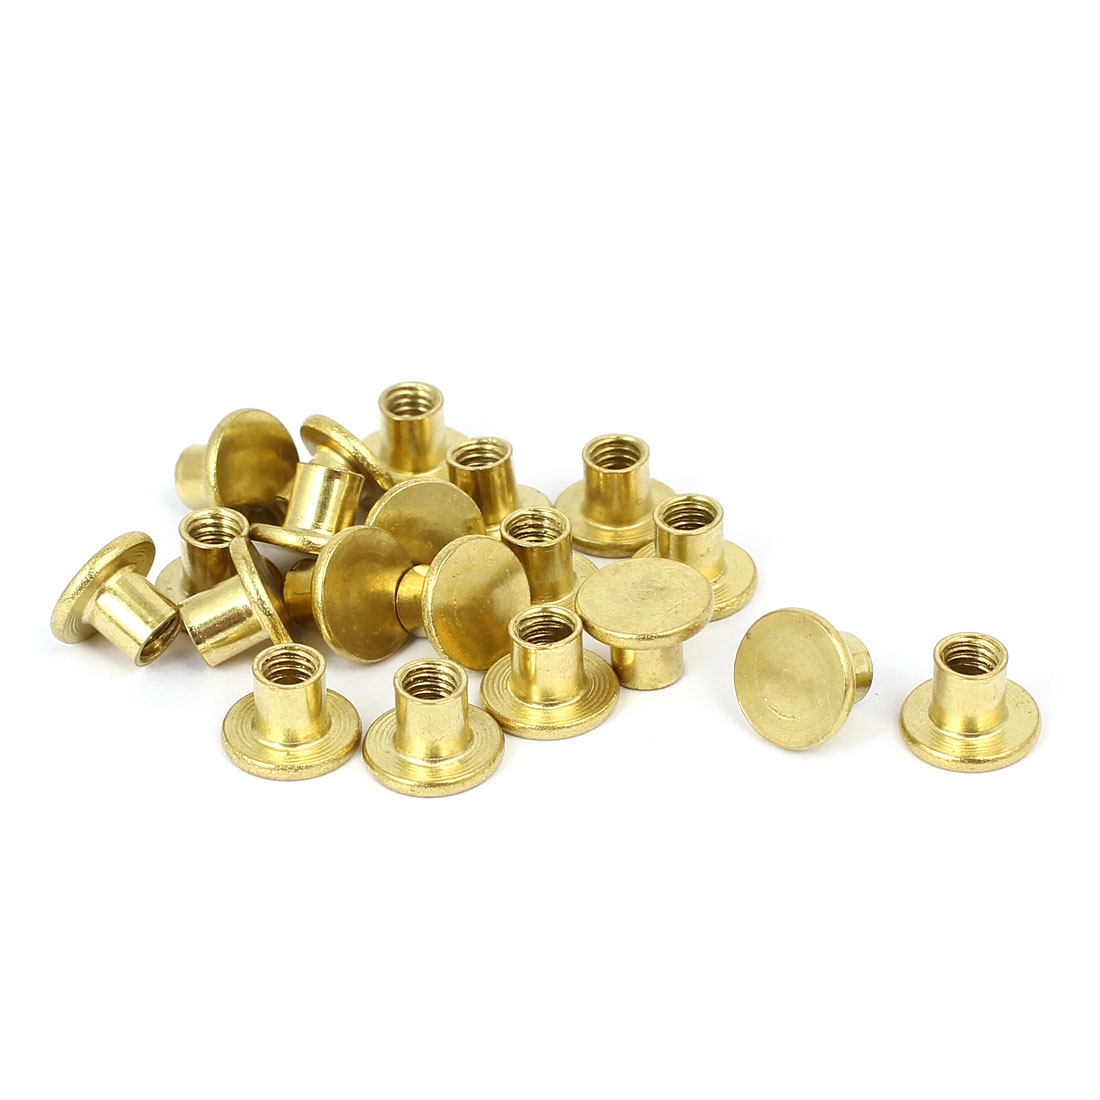 Photo Album Metal Brass Plated Binding Screw Post Nut 5mmx5mm 20pcs